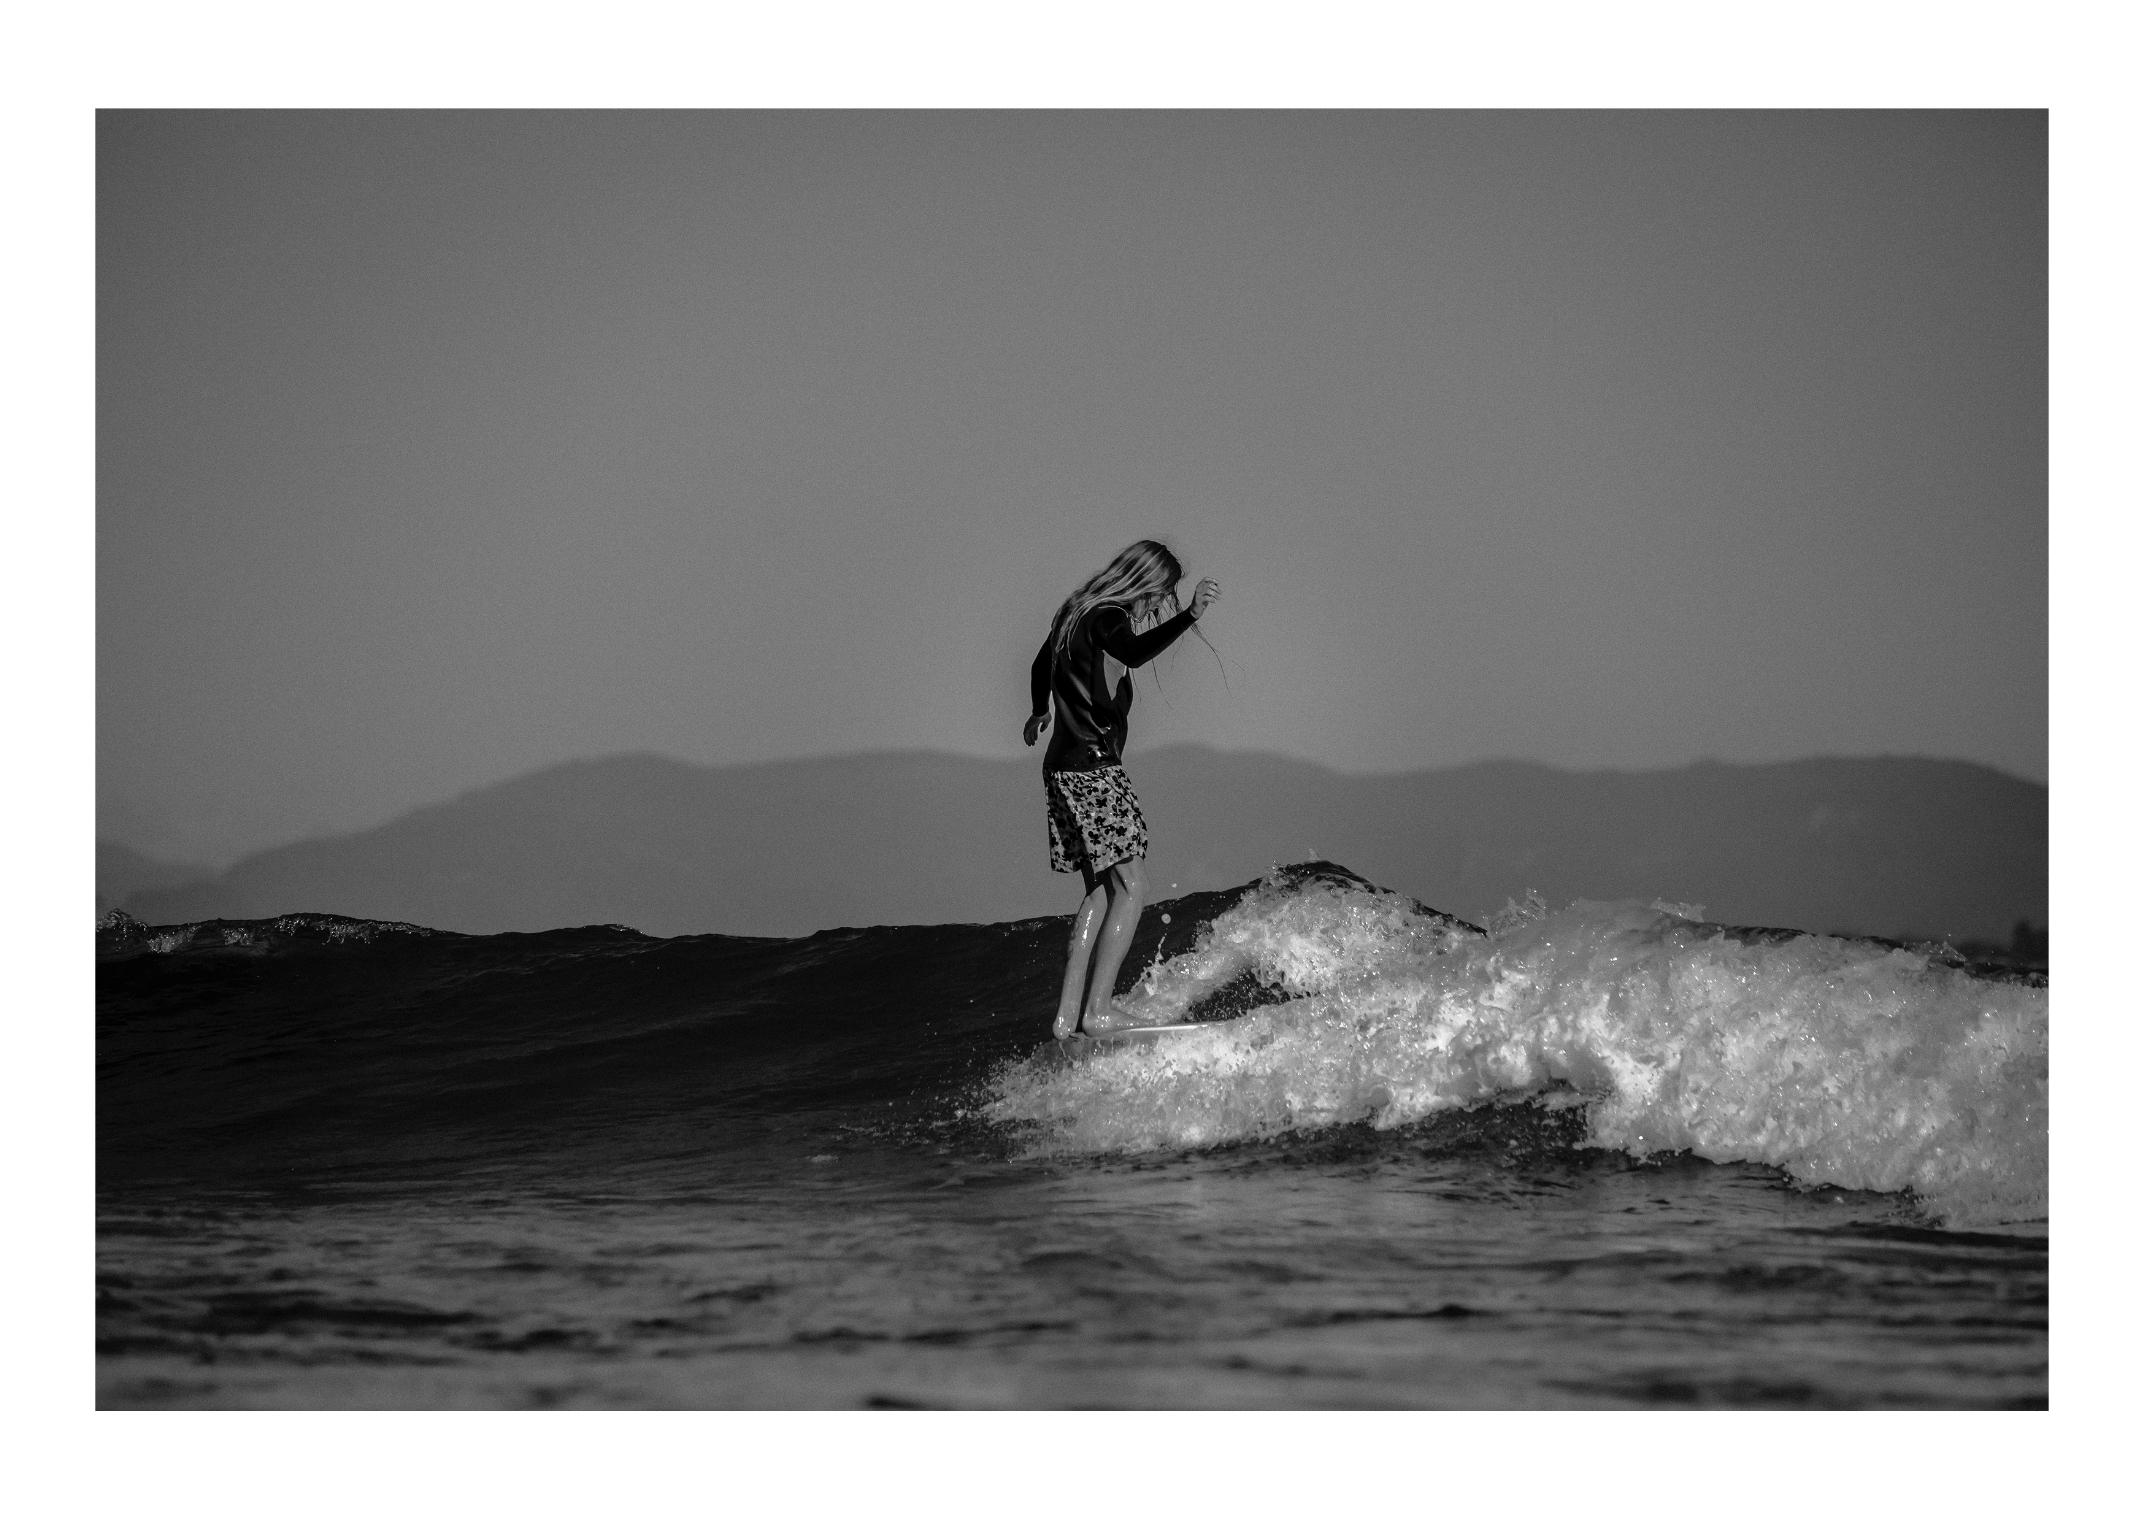 Fabien_voileau_salt_water_byron_bay_surf_Jye_whyatt_4